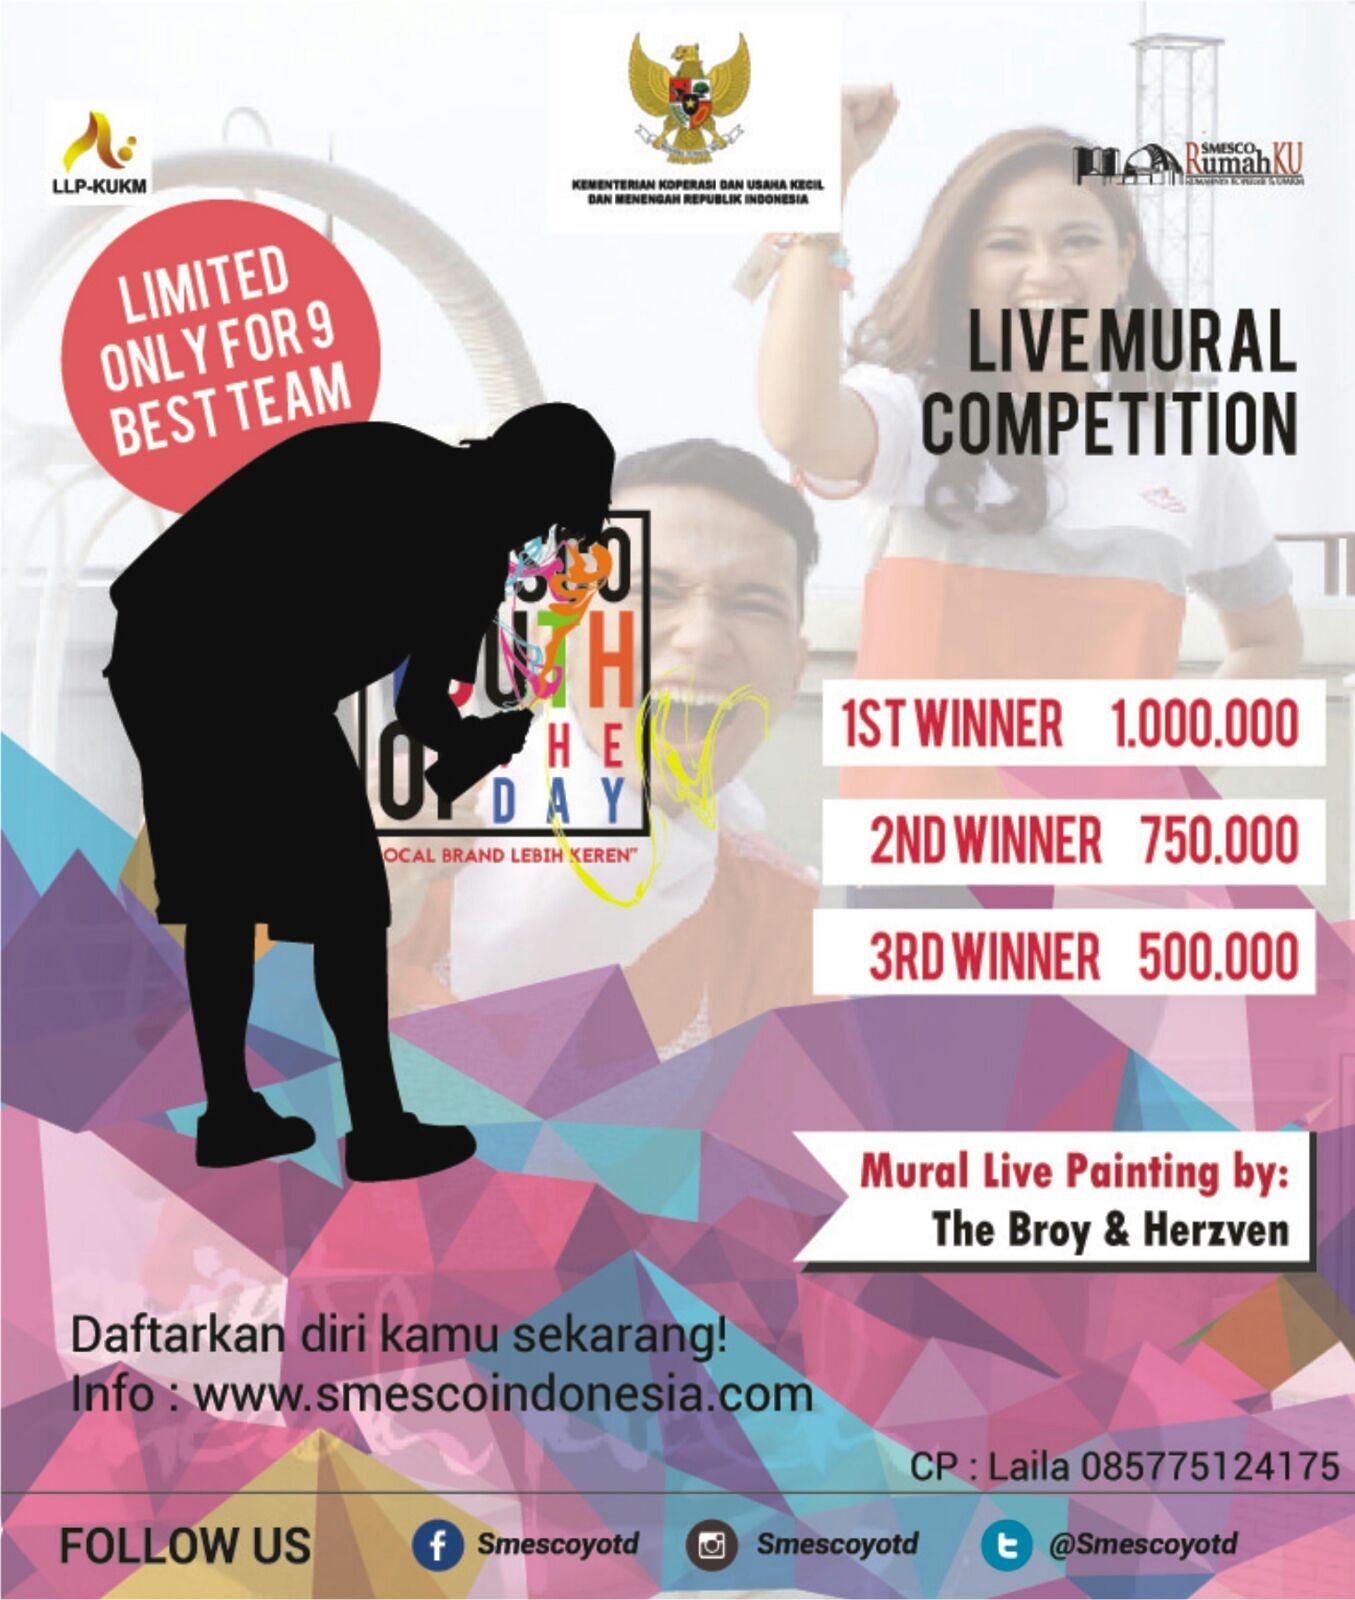 October 2015 Smesco Promo Produk Ukm Bumn Bahan Songket Sulam Katun Merah Live Mural Competition